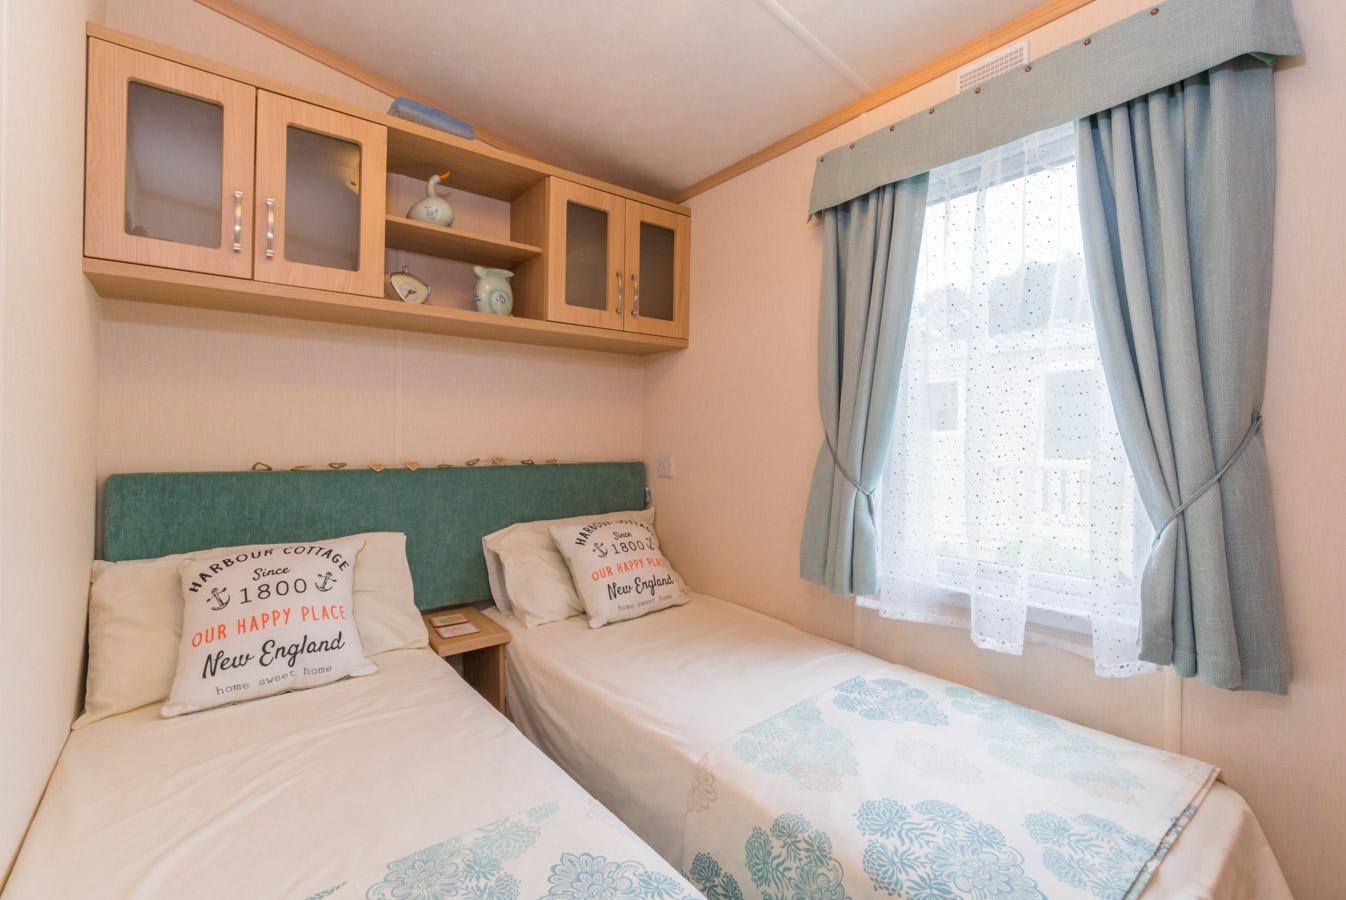 Neil-Bigwood-Monkton-Wyld-Holiday-Homes-15